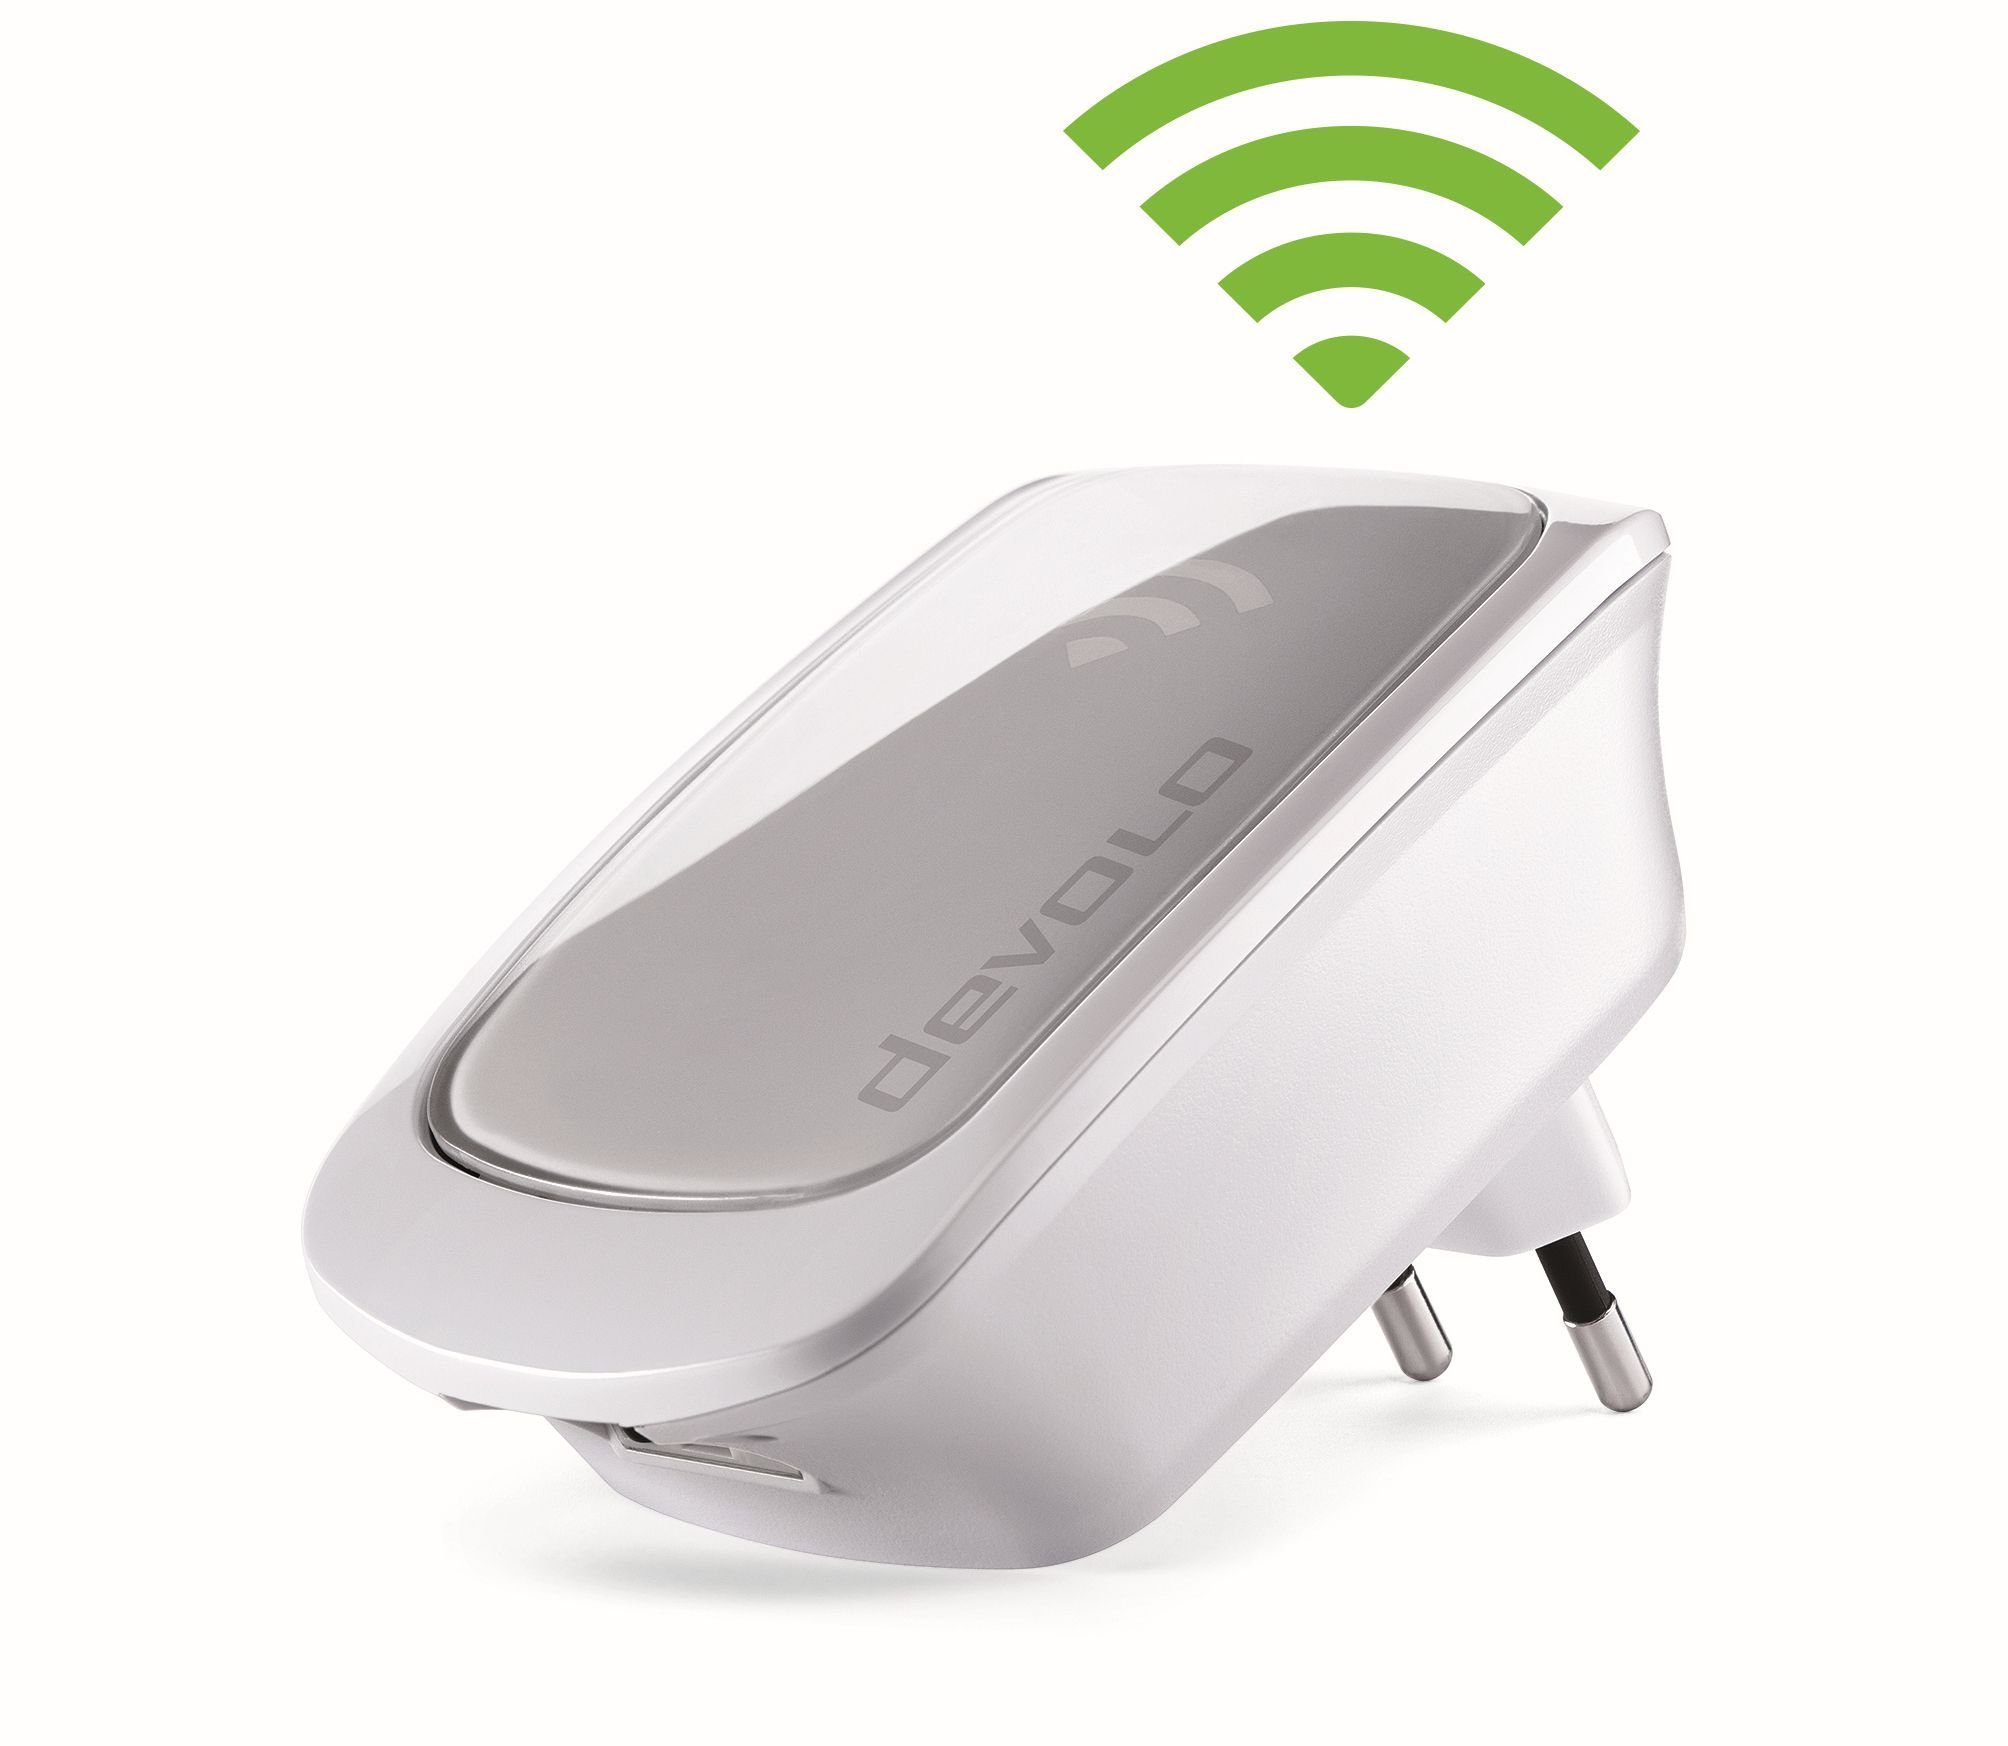 DEVOLO WLAN »WiFi Repeater (300Mbit, 1xLAN, WPS, Verstärker)«